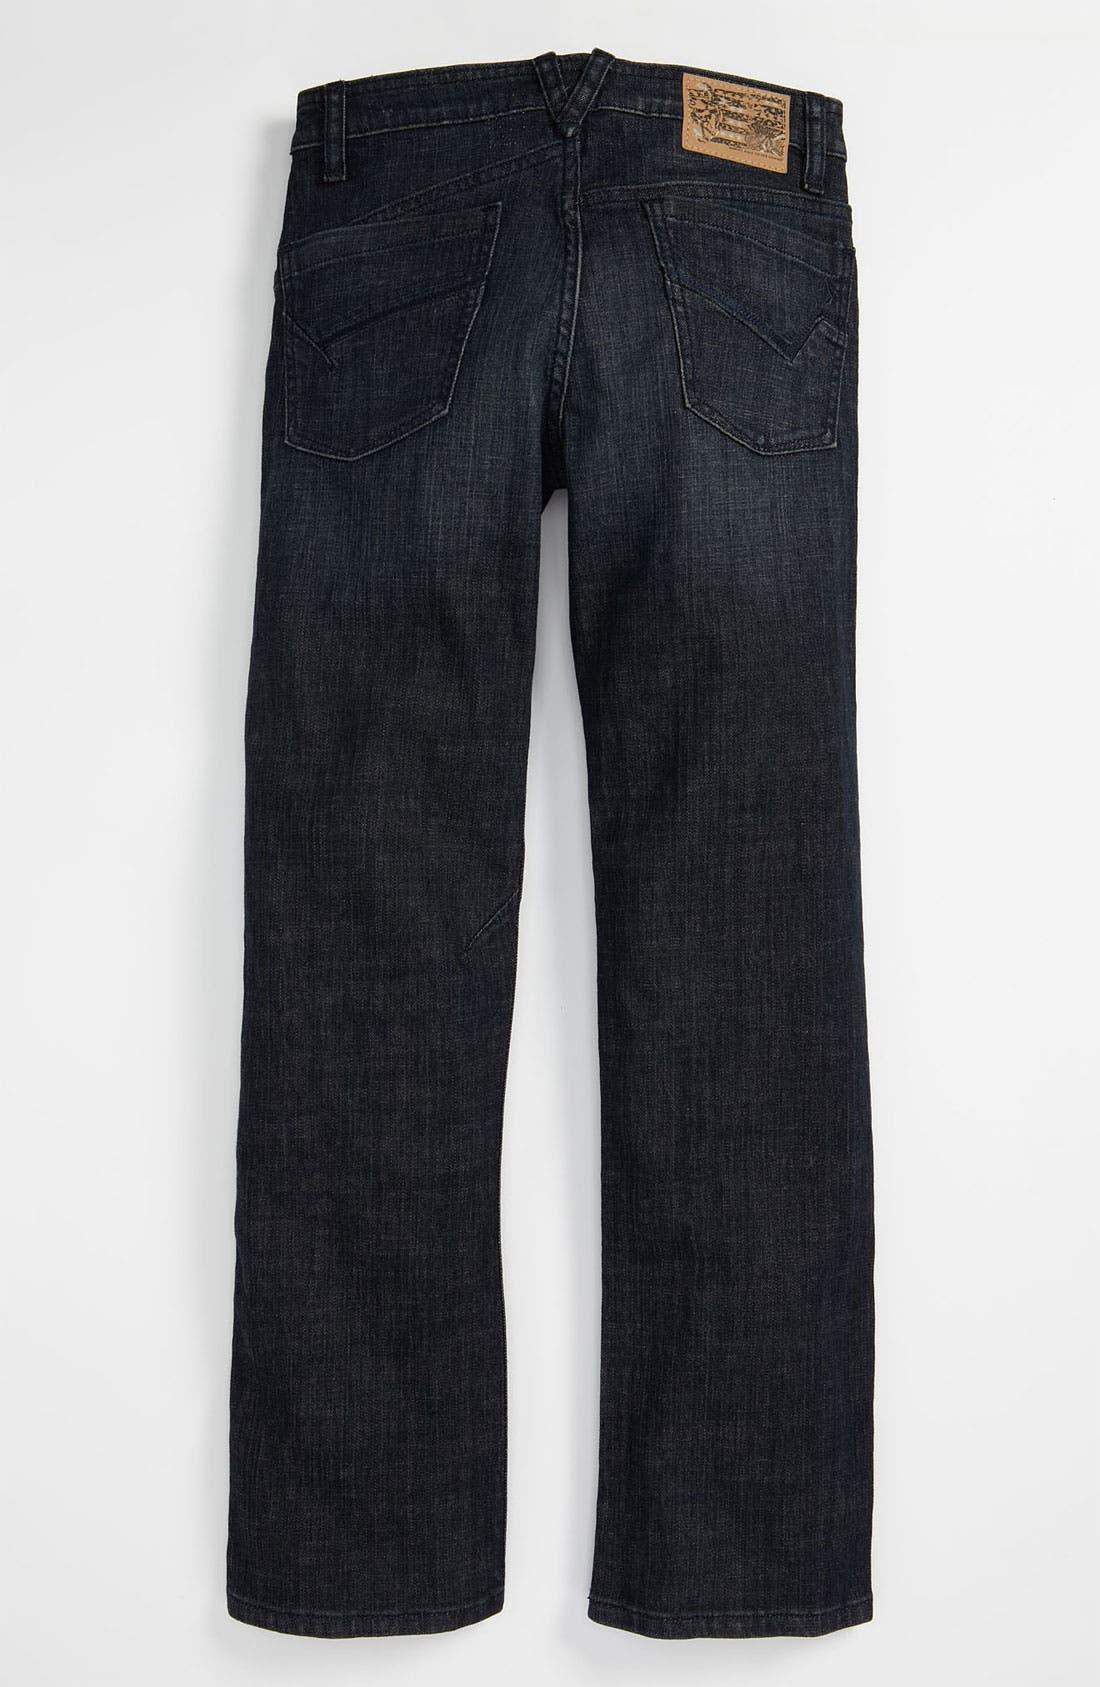 Alternate Image 1 Selected - Volcom 'Enowen' Straight Leg Jeans (Big Boys)